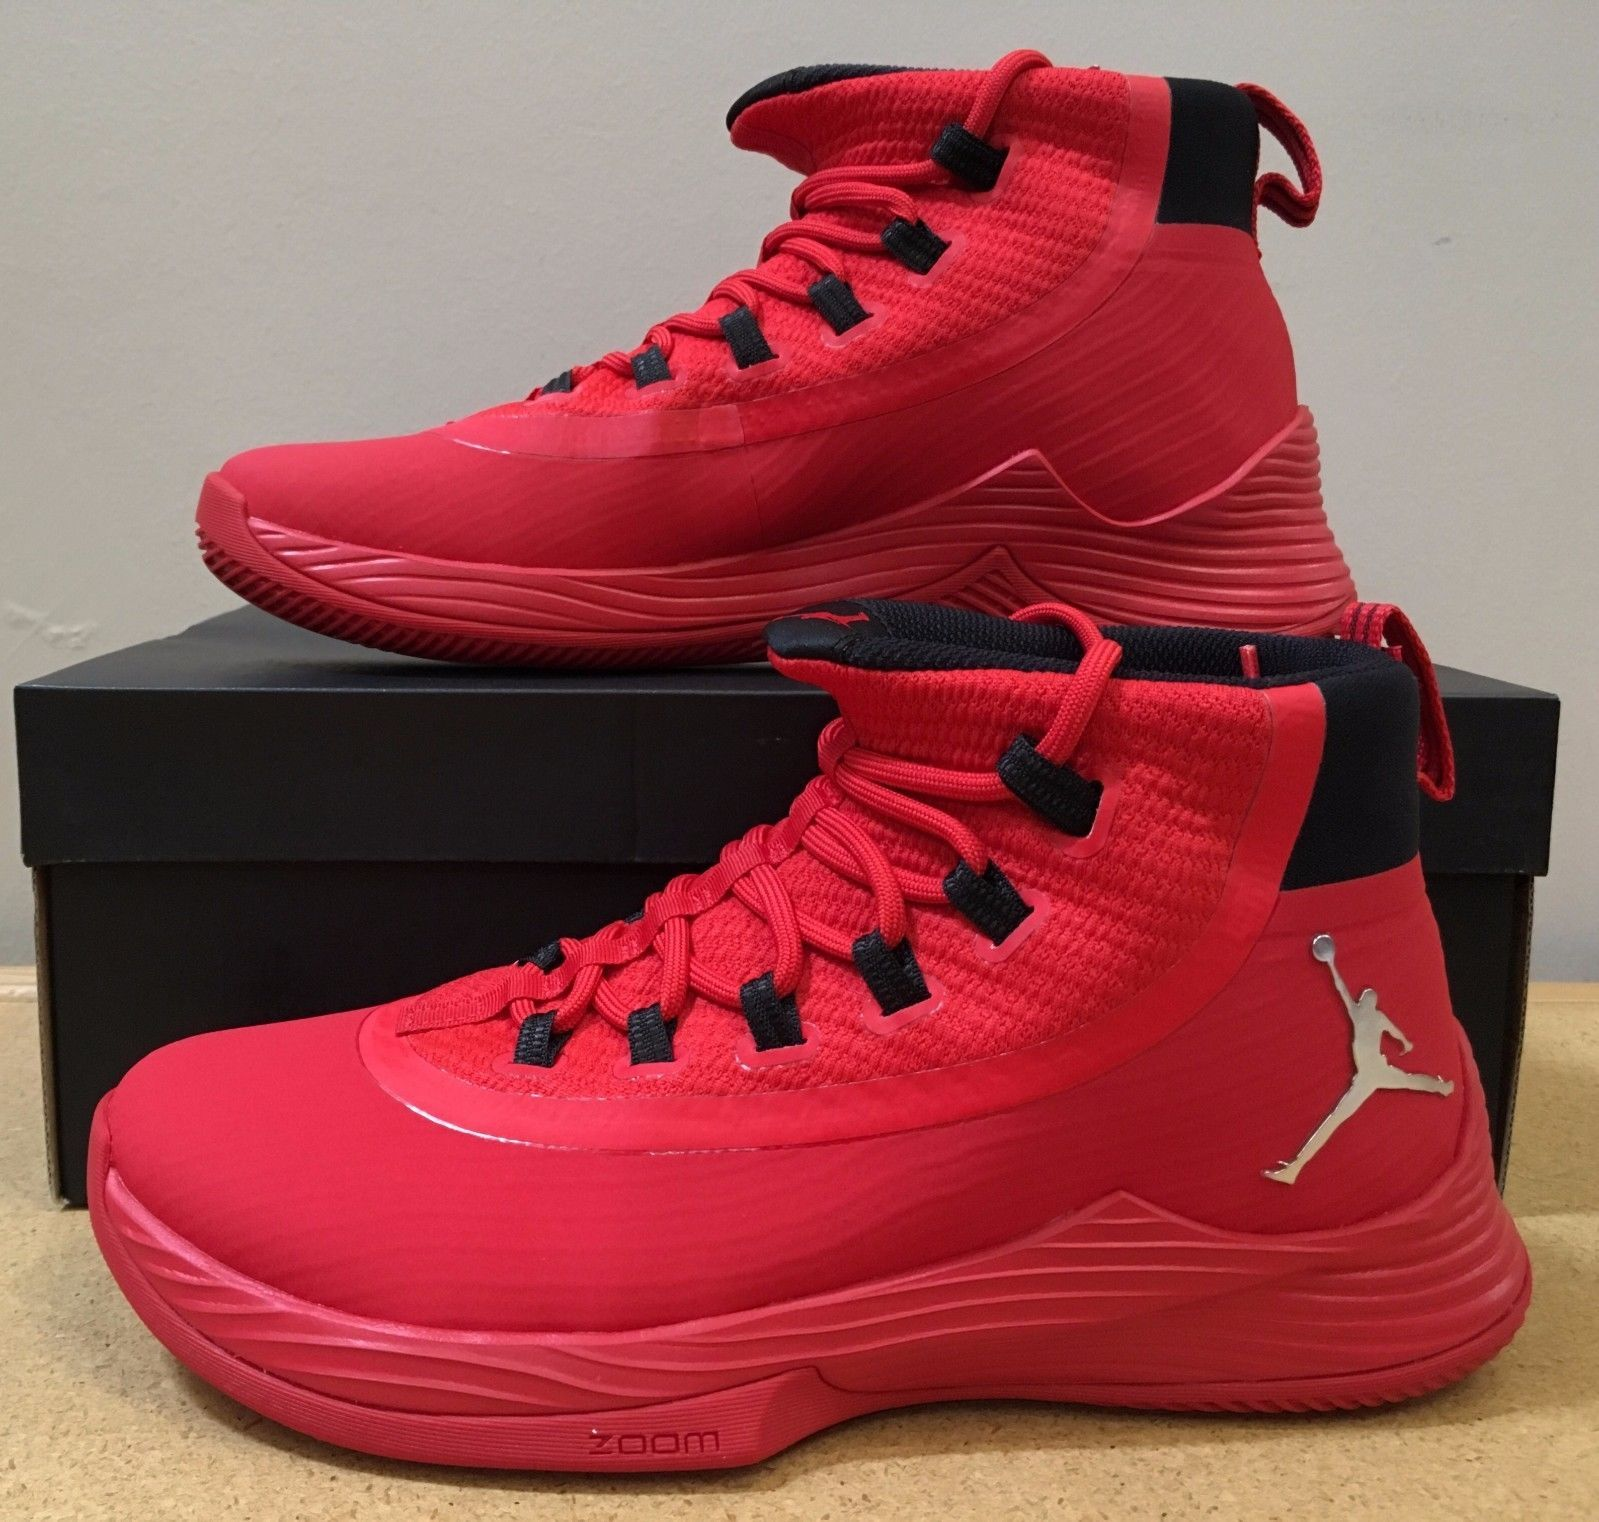 reputable site 19719 31965 Nike 2017 Jordan Ultra Fly 2 TB Mens Basketball Shoes ...